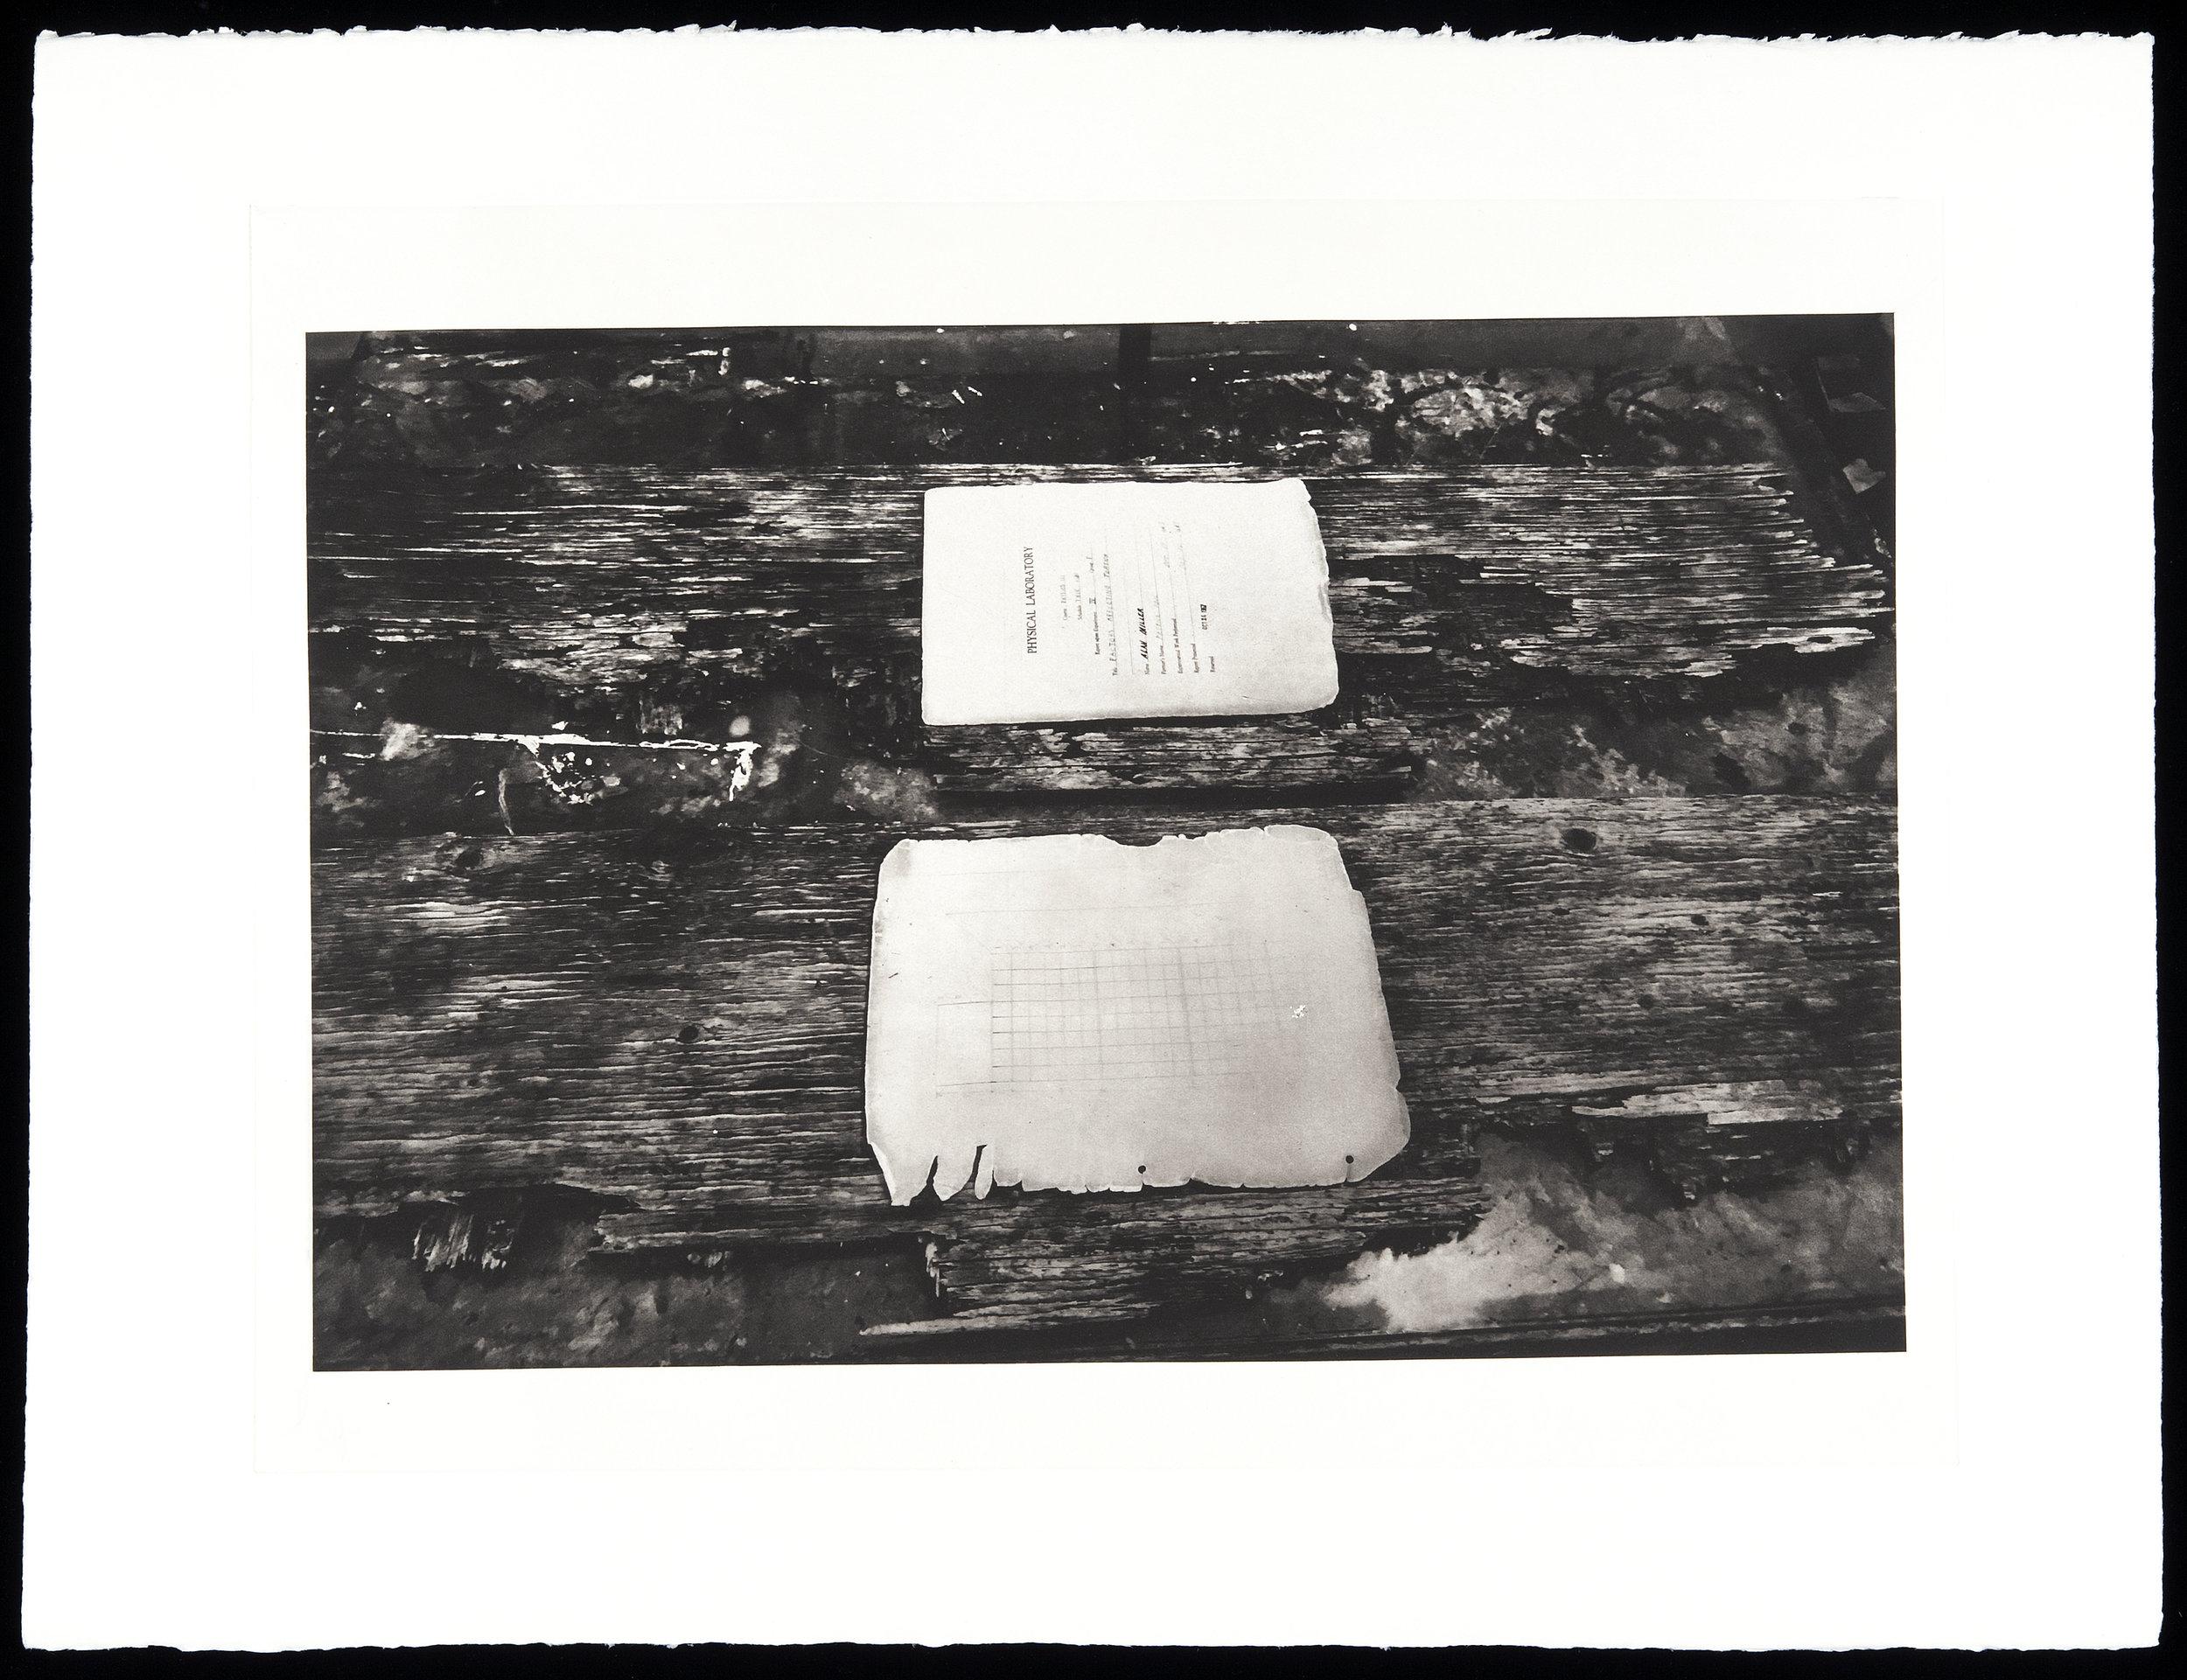 """Memorial to L.L. Dintiman"", 22"" x 30"", photogravure of wood sculpture"